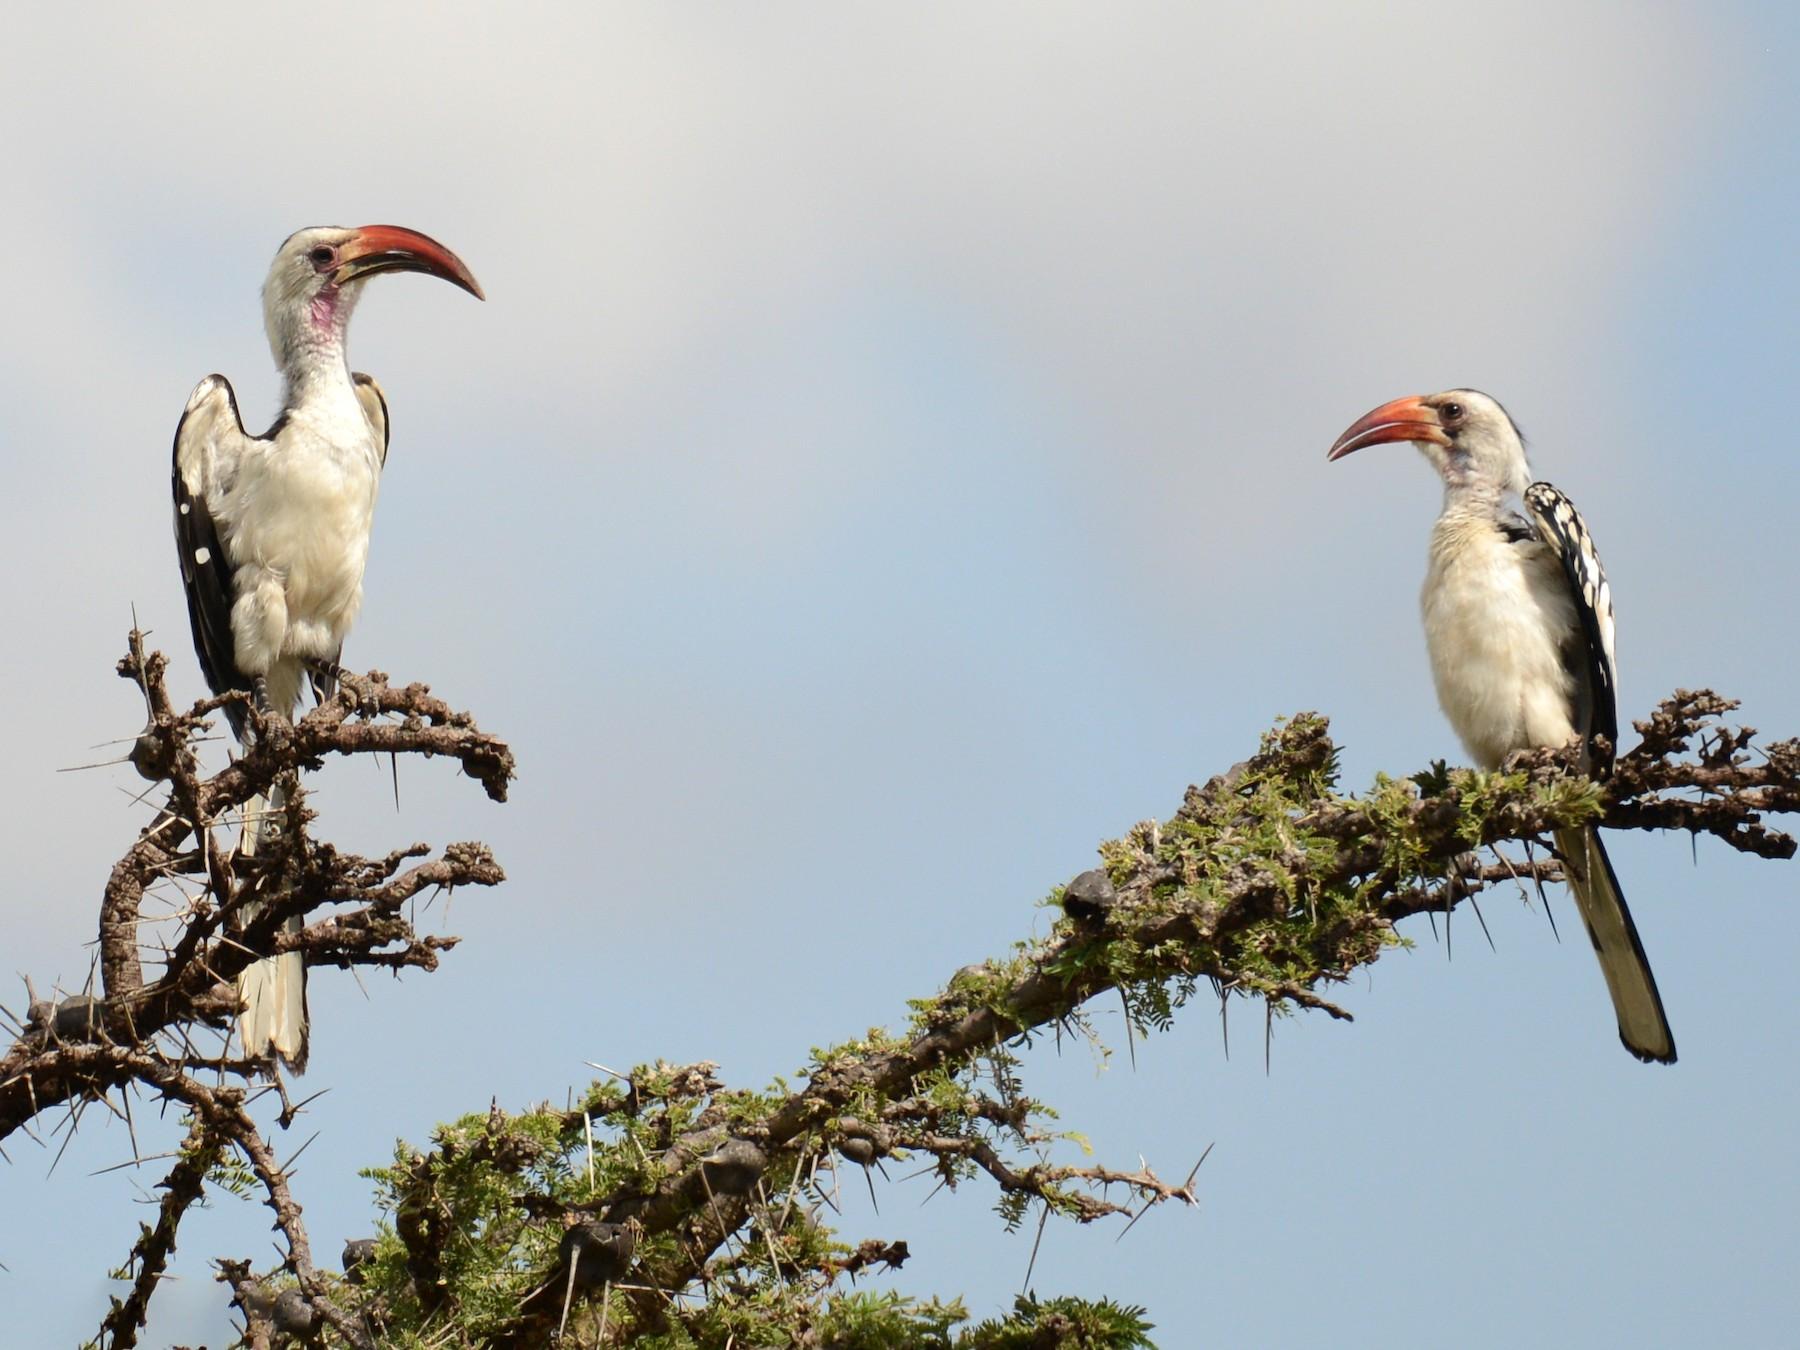 Northern Red-billed Hornbill - Adriana Dinu